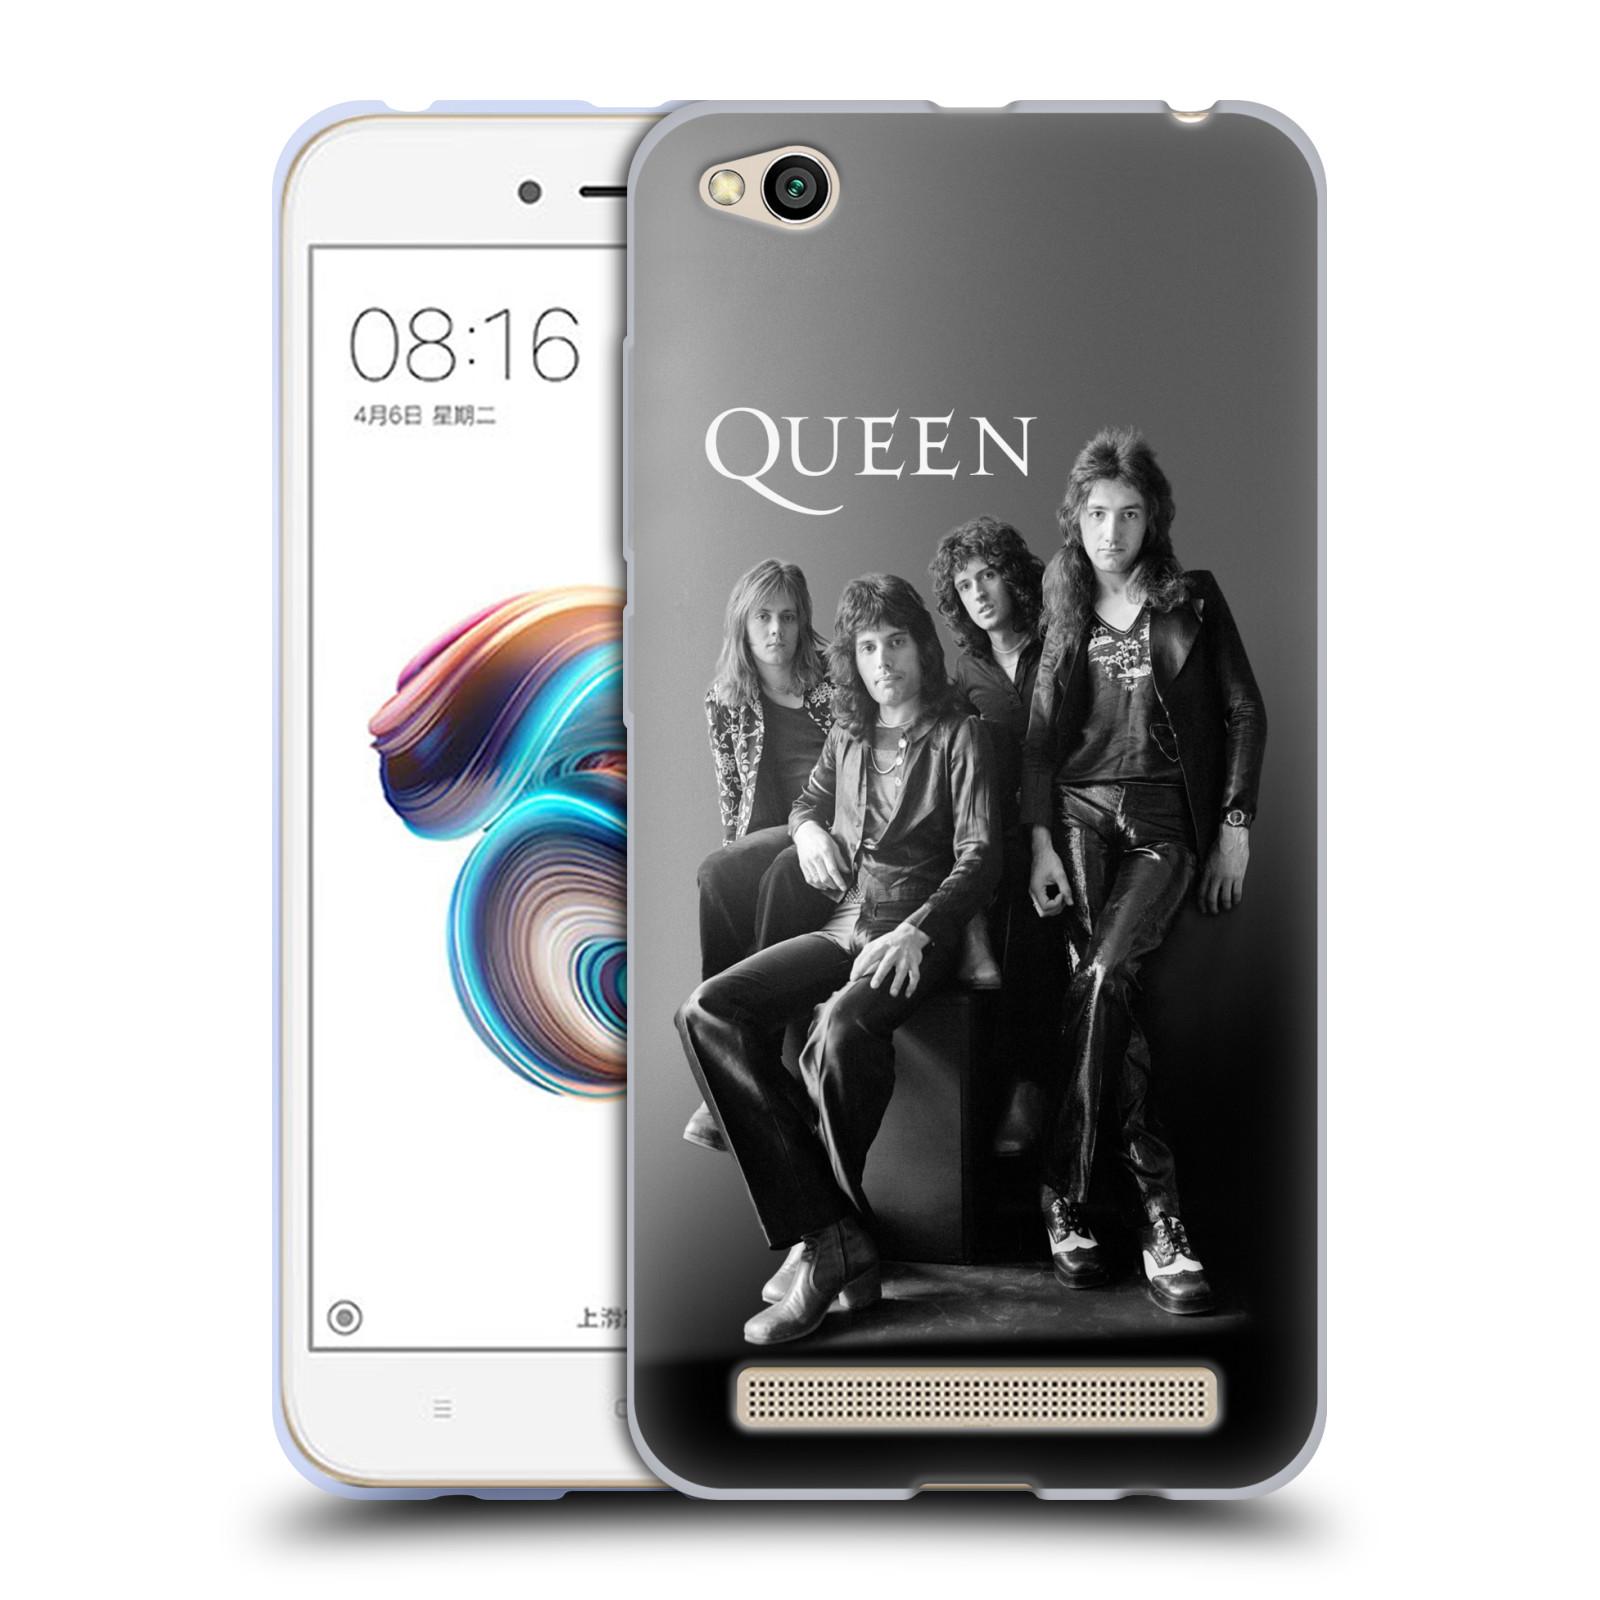 Silikonové pouzdro na mobil Xiaomi Redmi 5A - Head Case - Queen - Skupina